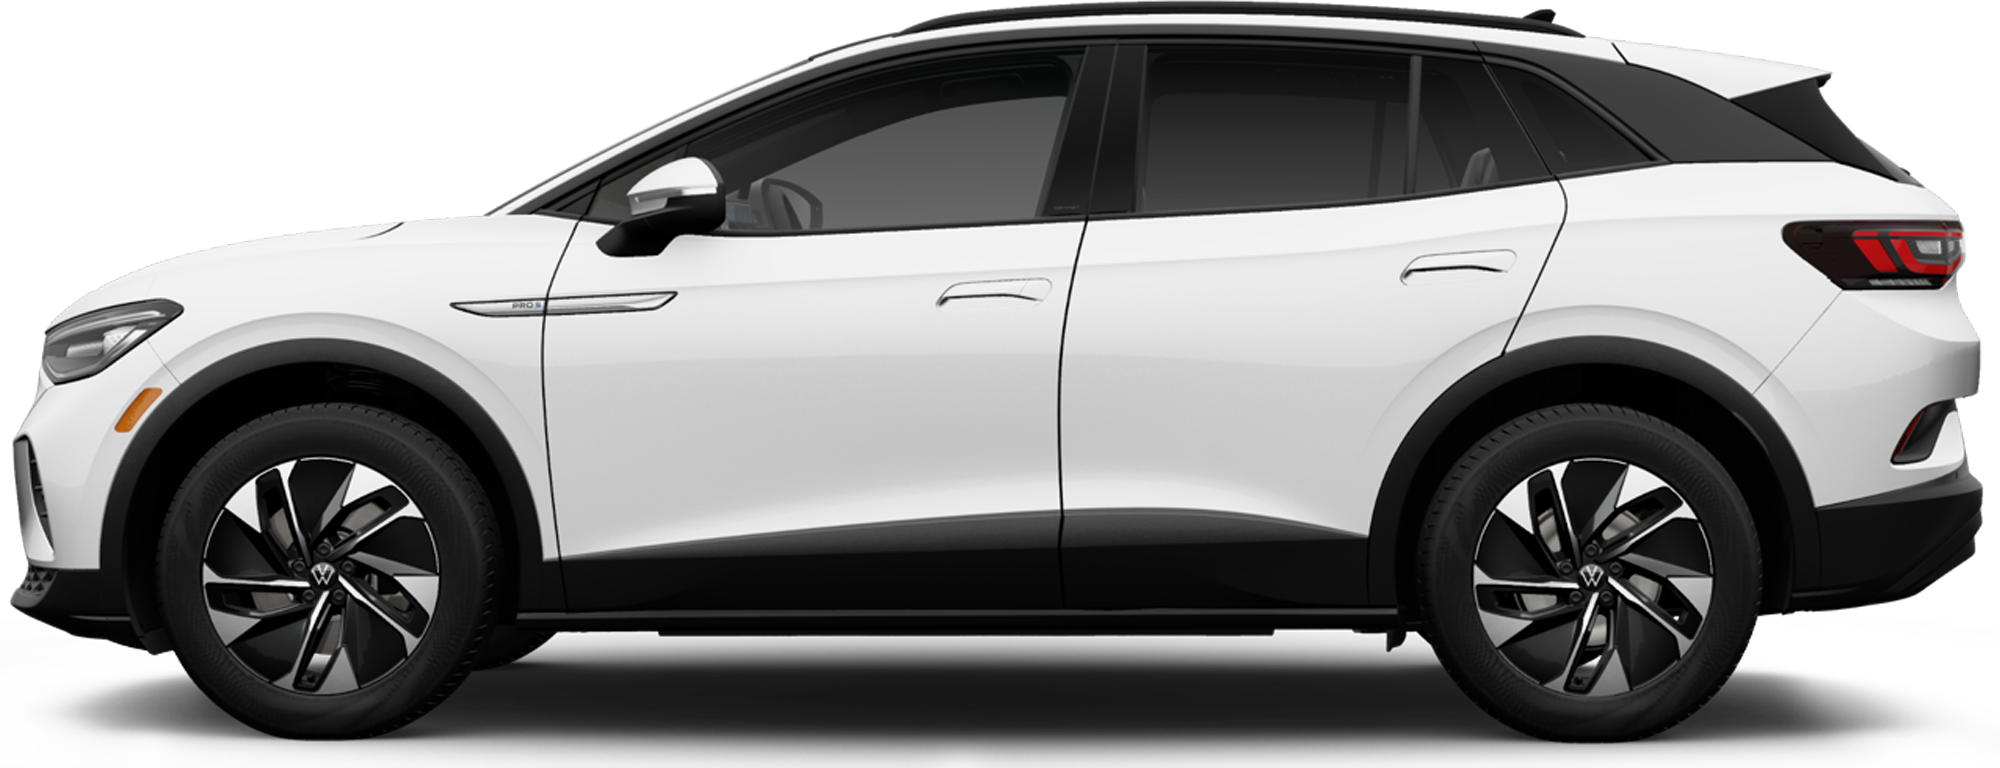 2021 Volkswagen ID.4 SUV Pro S